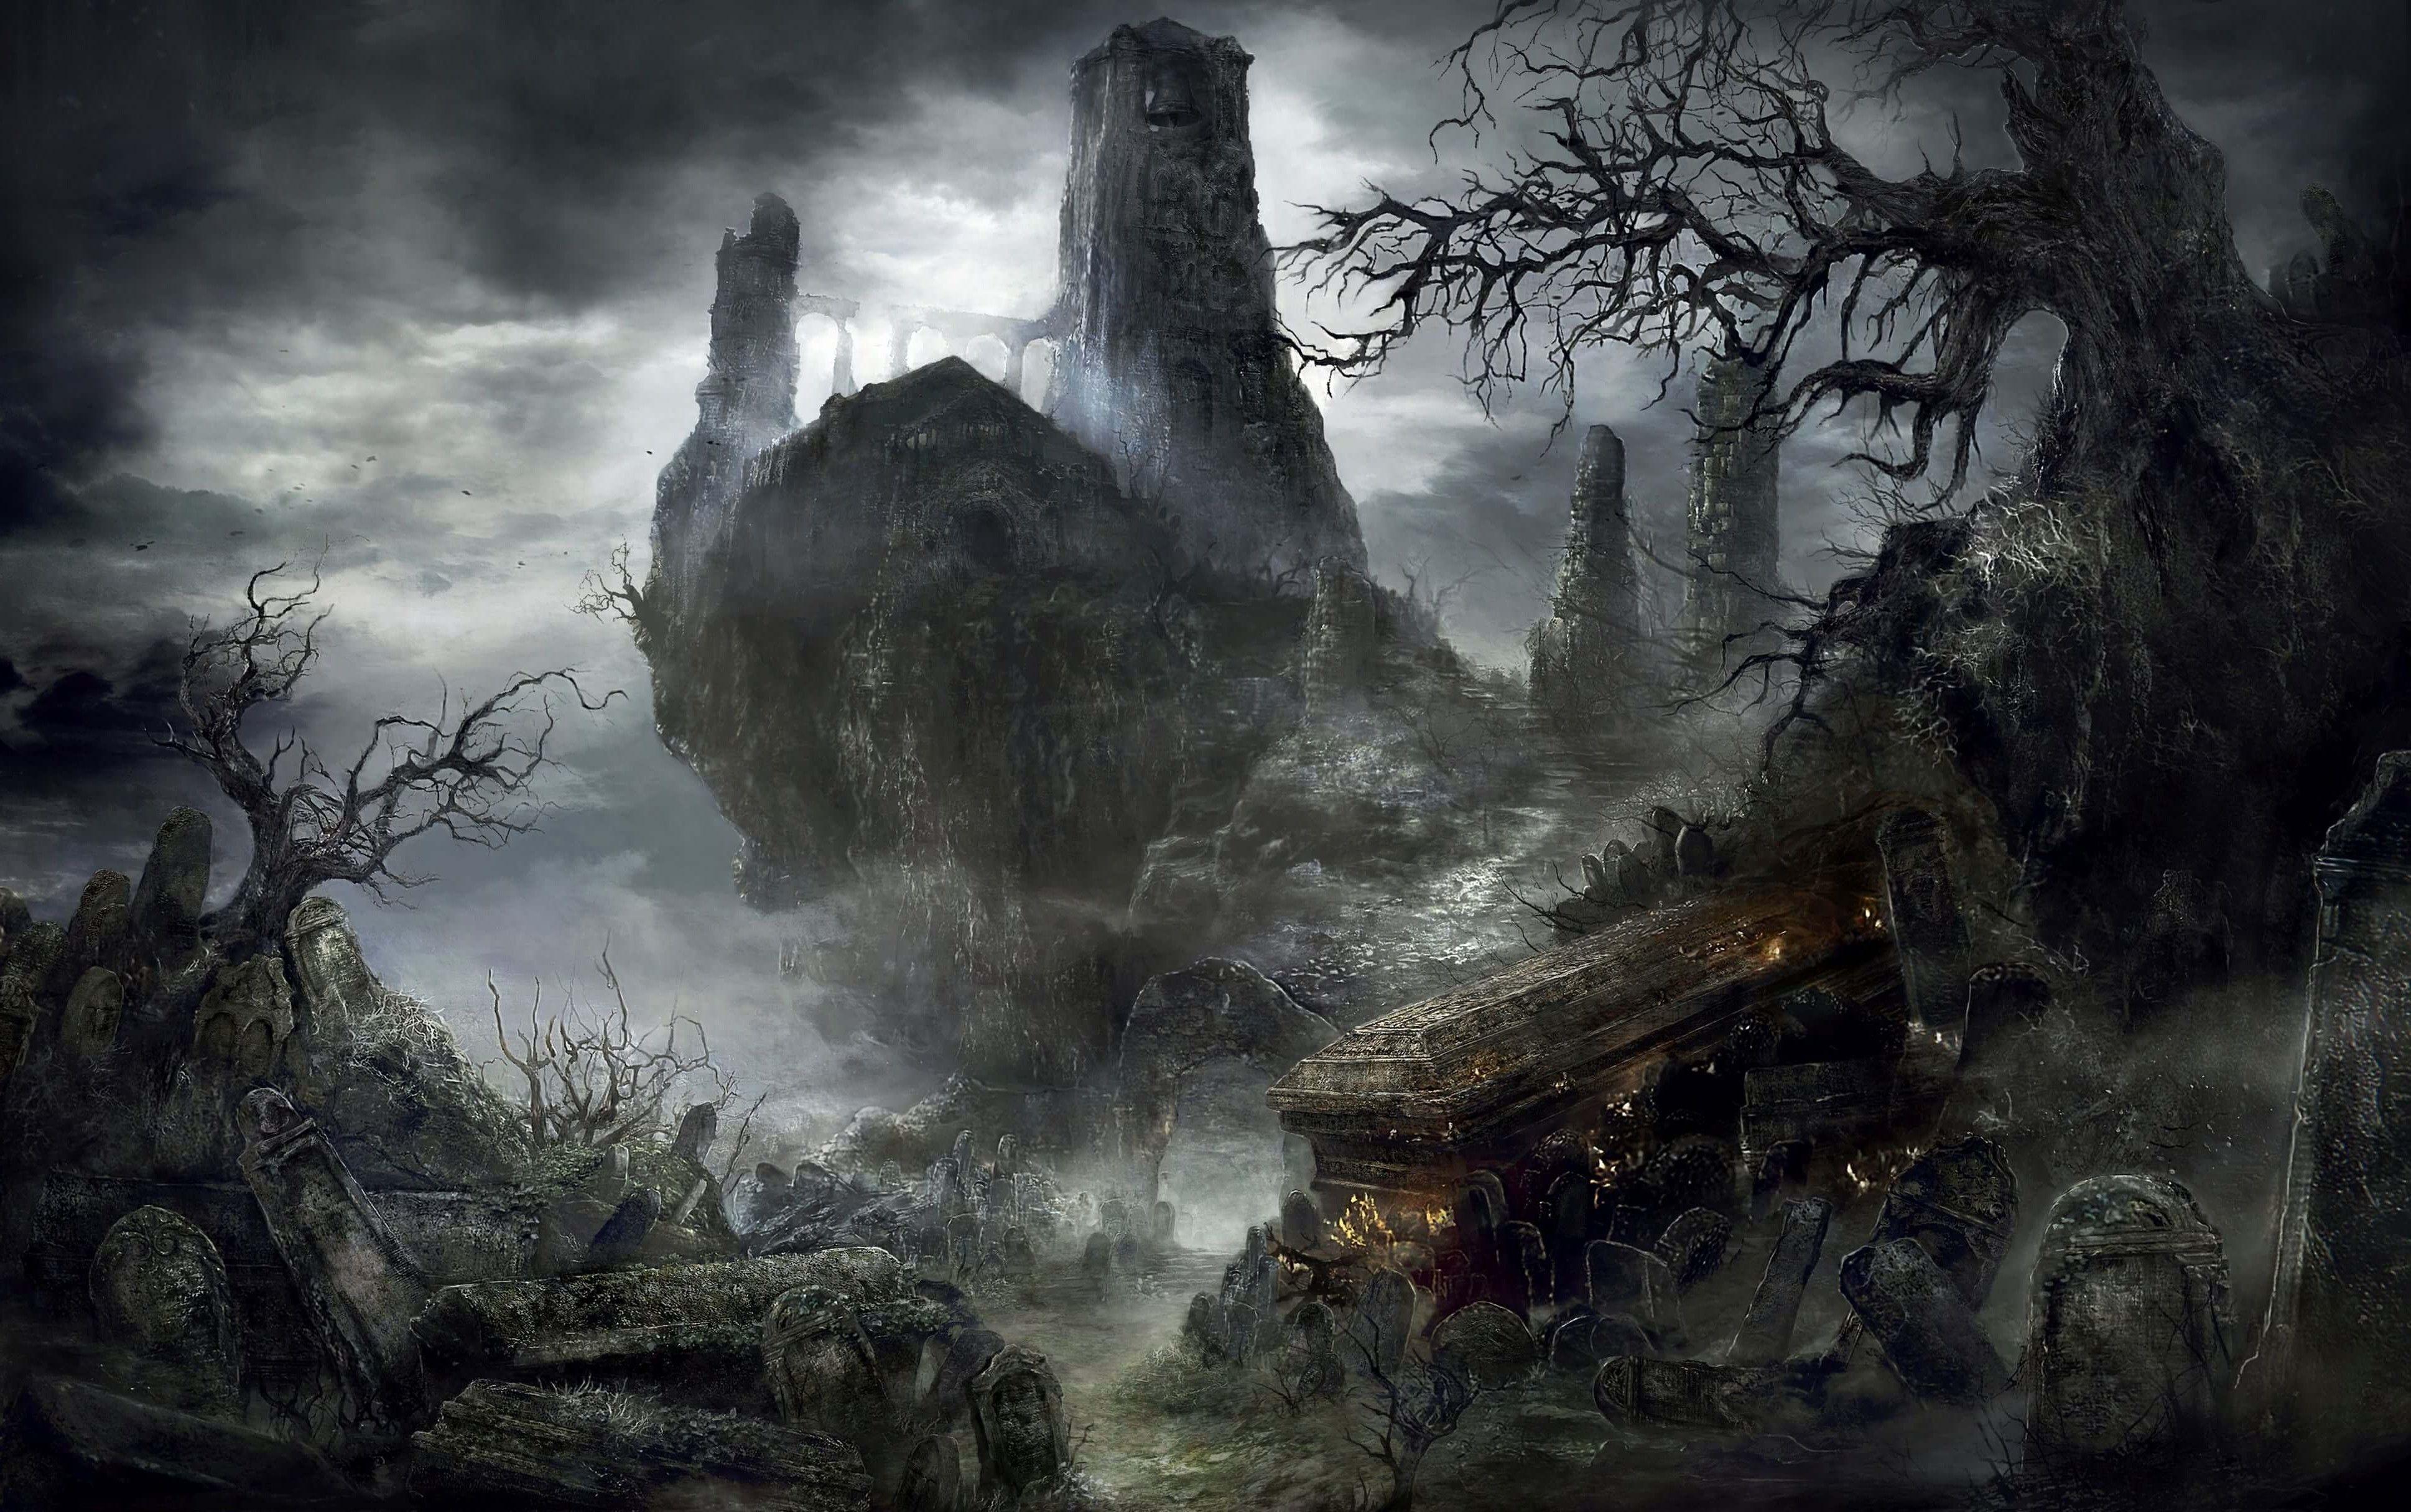 Dark Souls Iii Dark Souls Gothic Midevil Dark Video Games